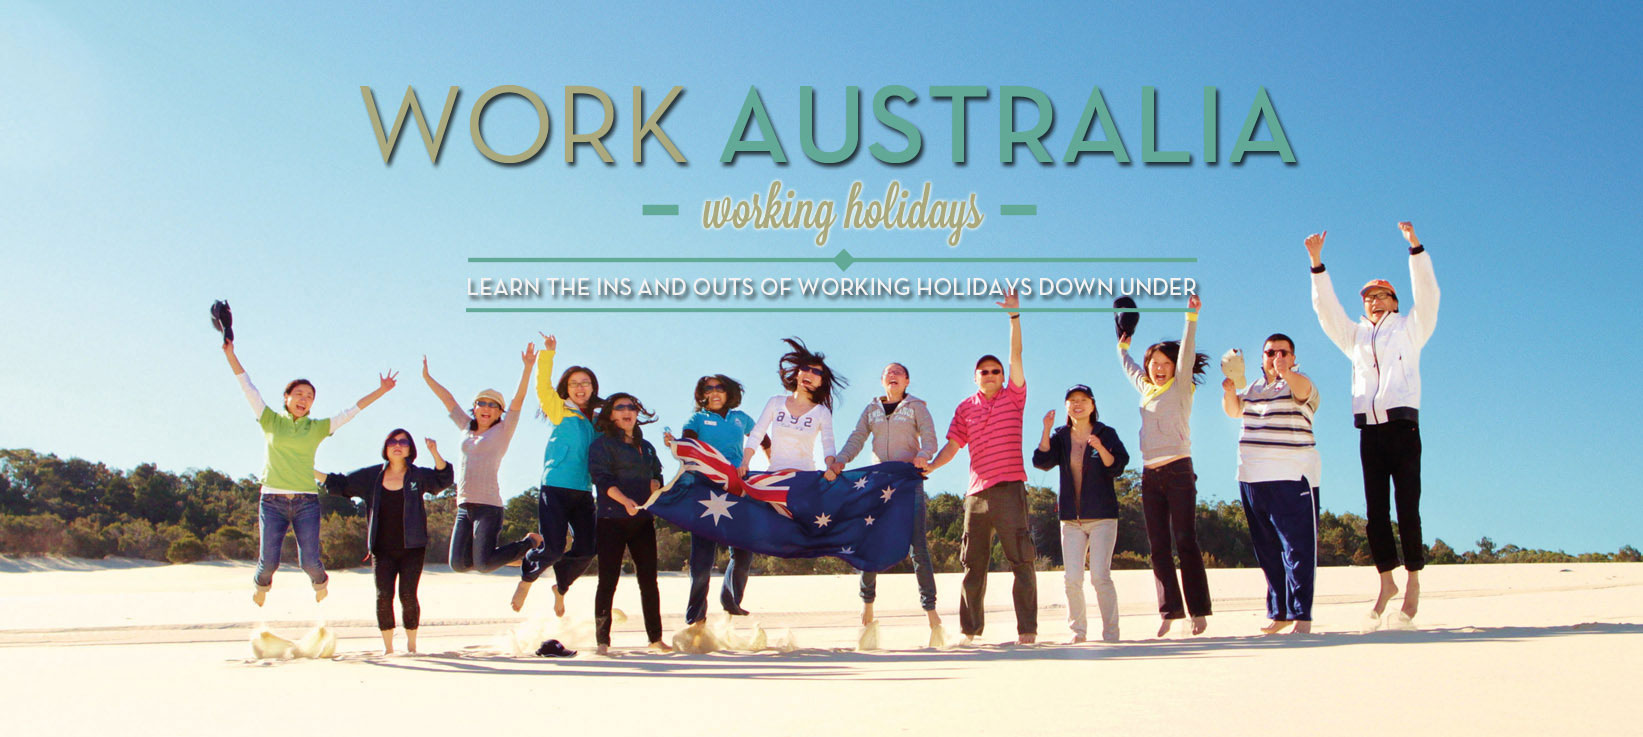 Working Holiday Visa for Australia from Dubai, UAE